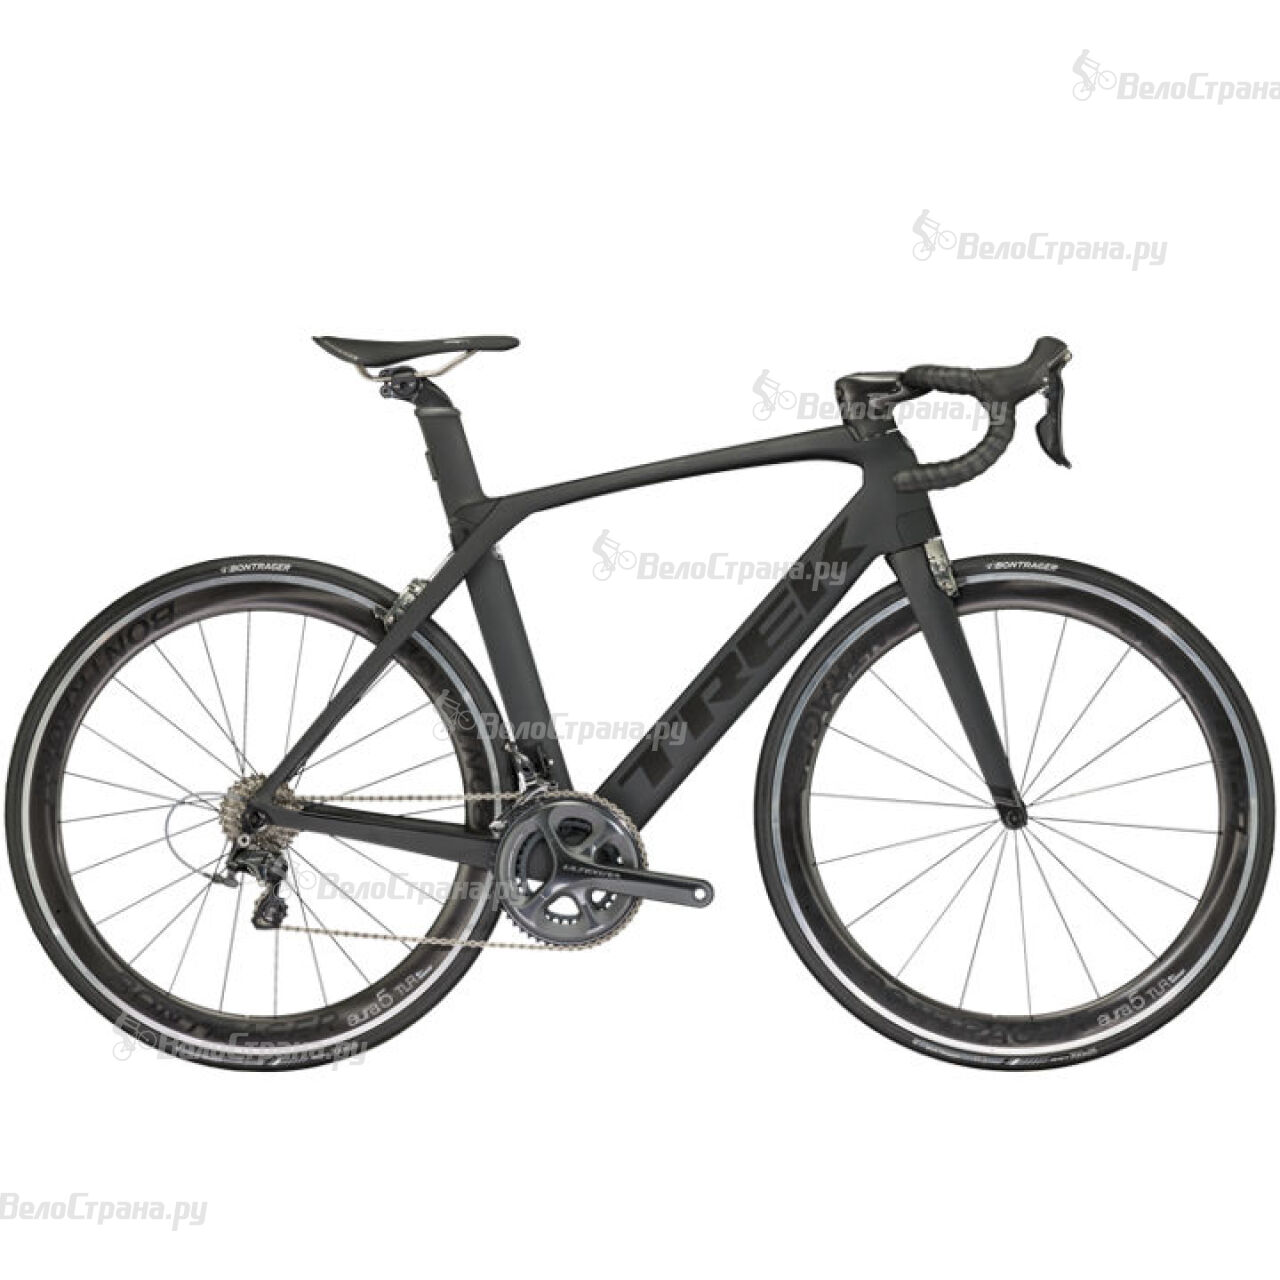 Велосипед Trek MADONE 9.2 C H2 (2017) велосипед trek 1 2 c h2 2013